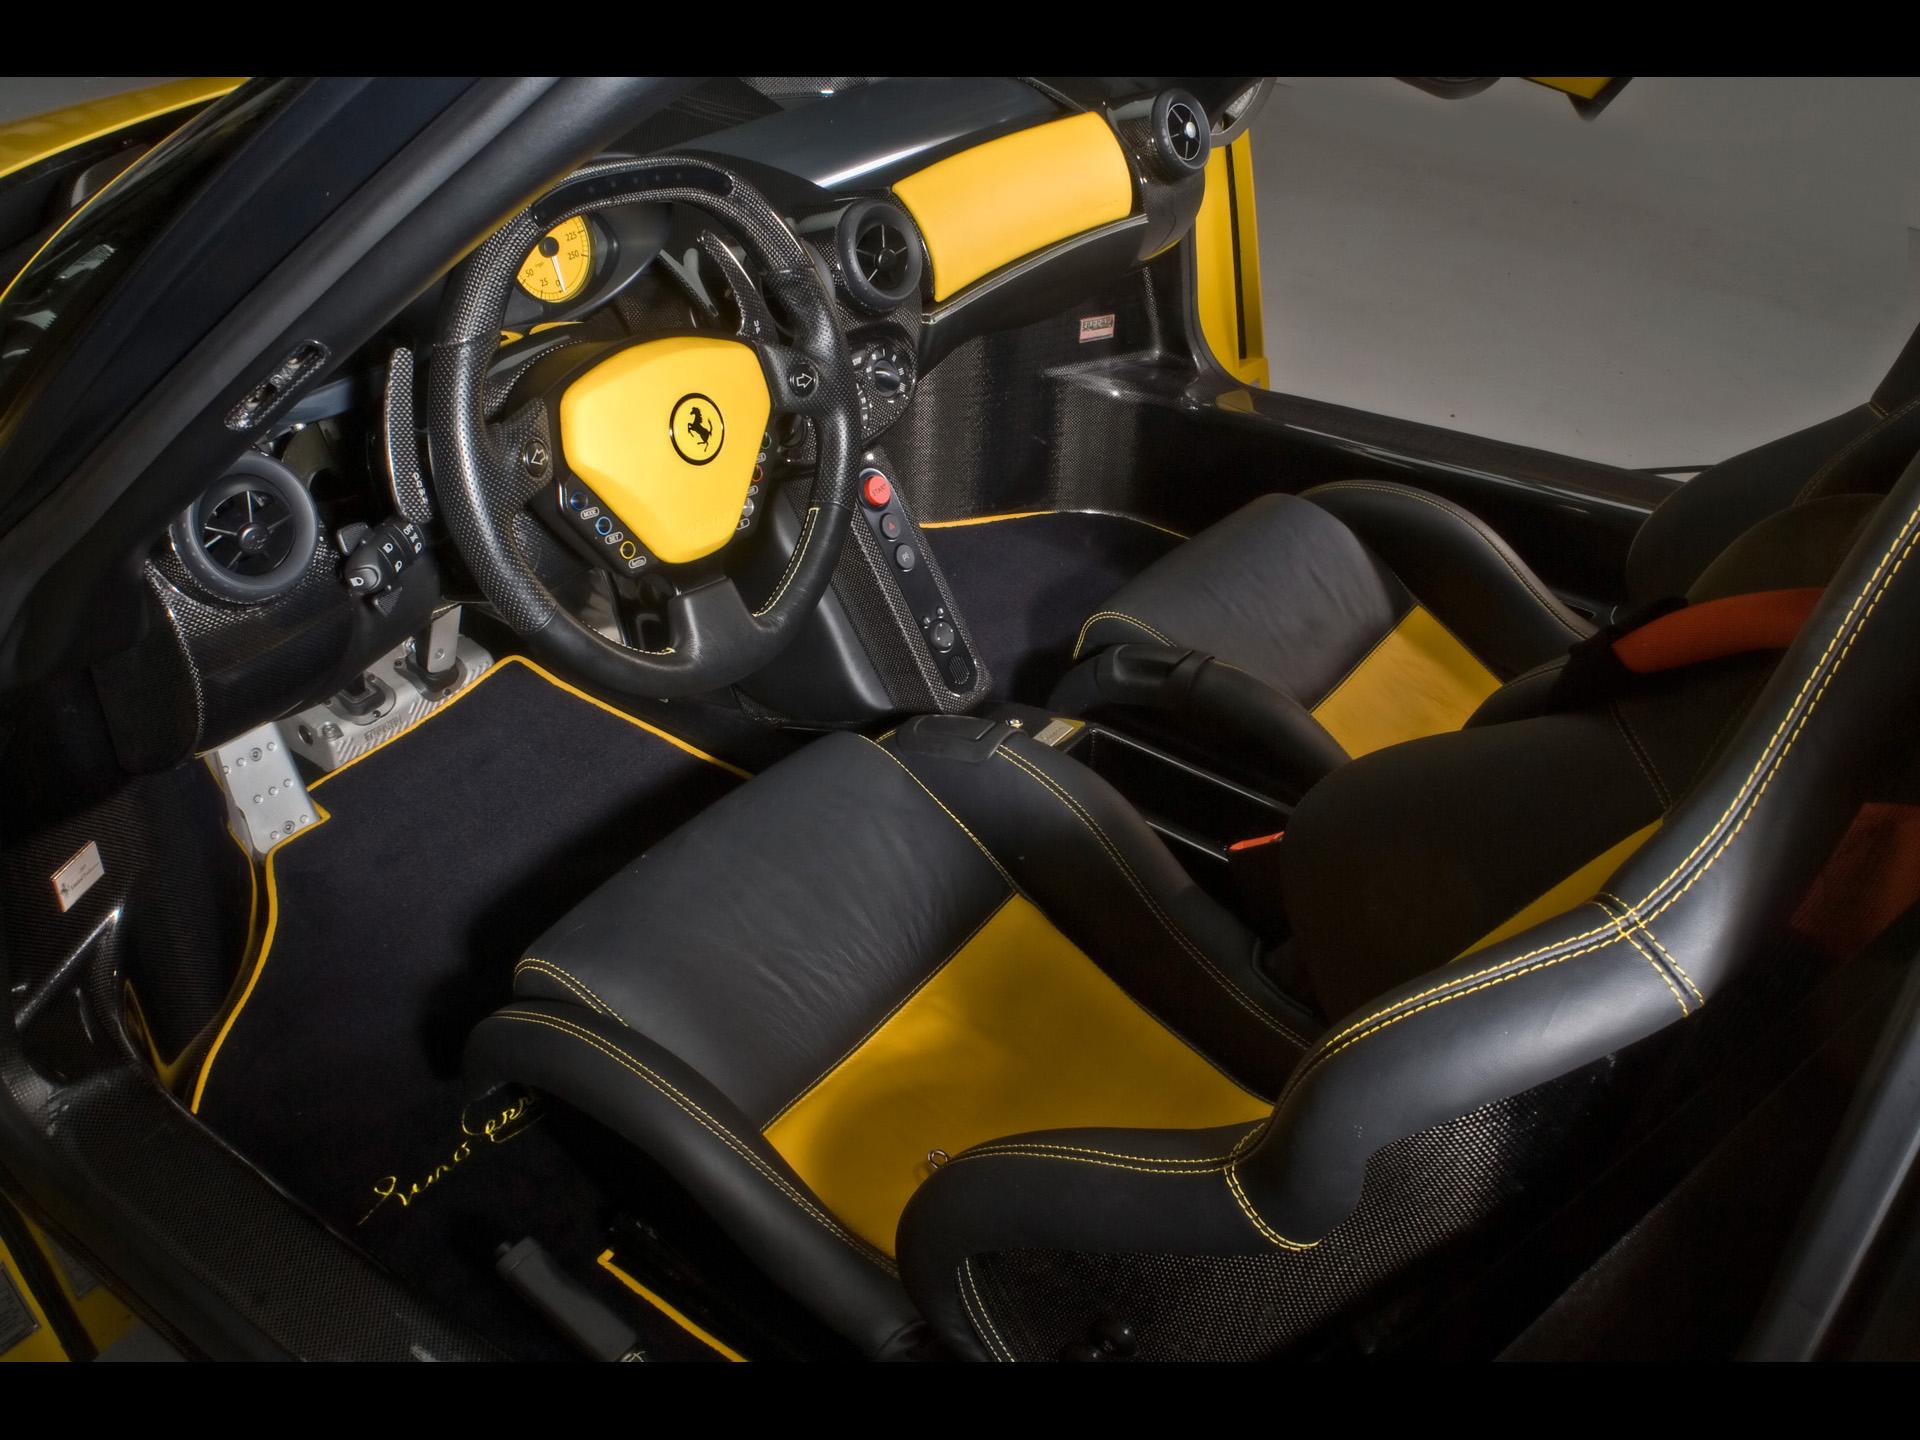 Enzo Ferrari Wallpaper Hot The Top Most Beautiful Ferrari In